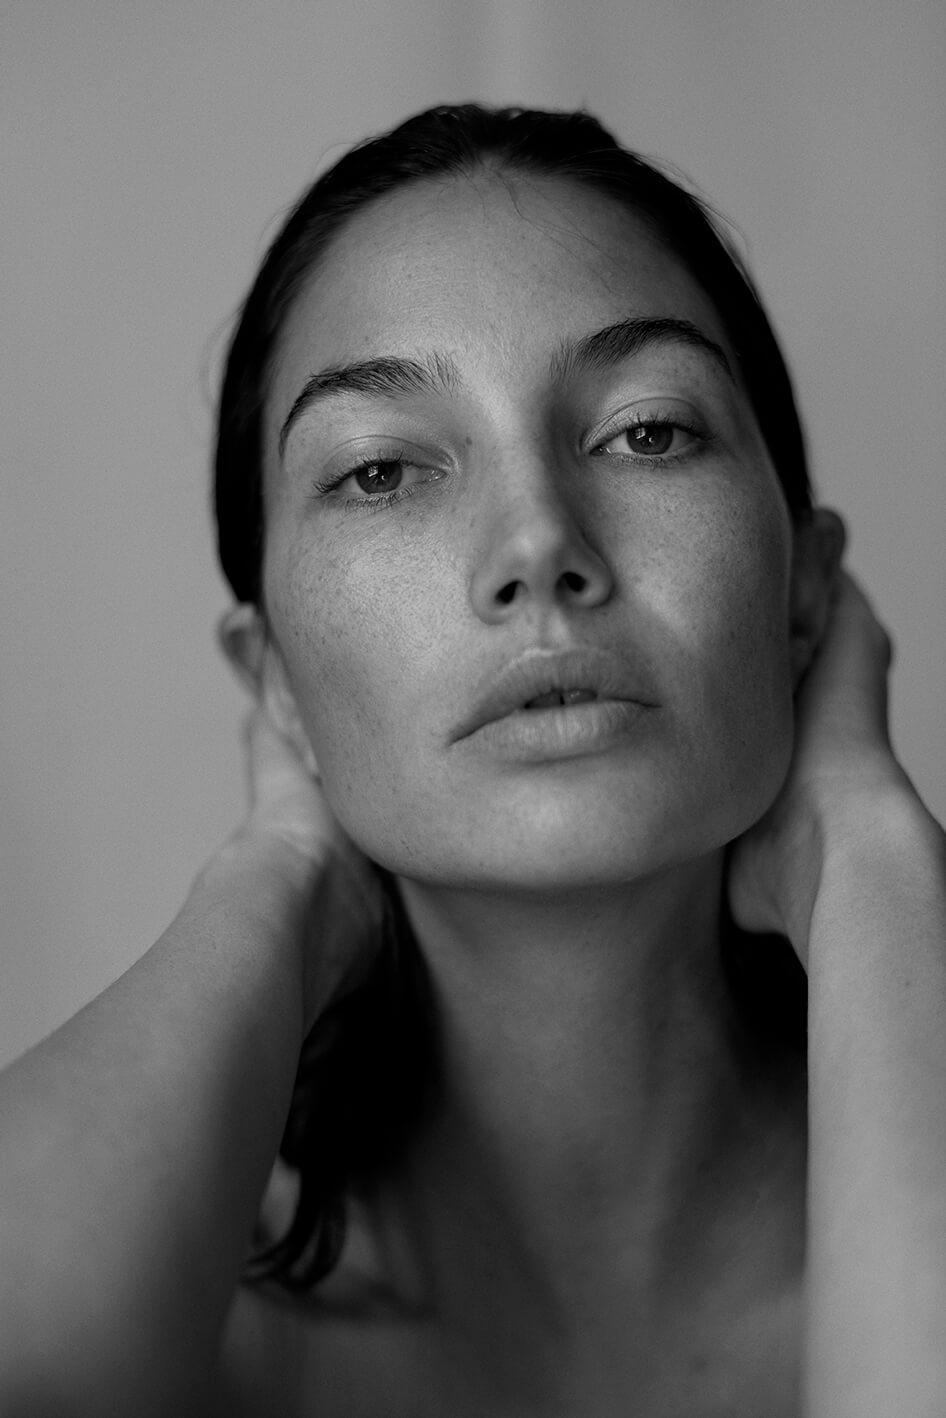 Portrait of Lily Aldridge by Alex Waltl